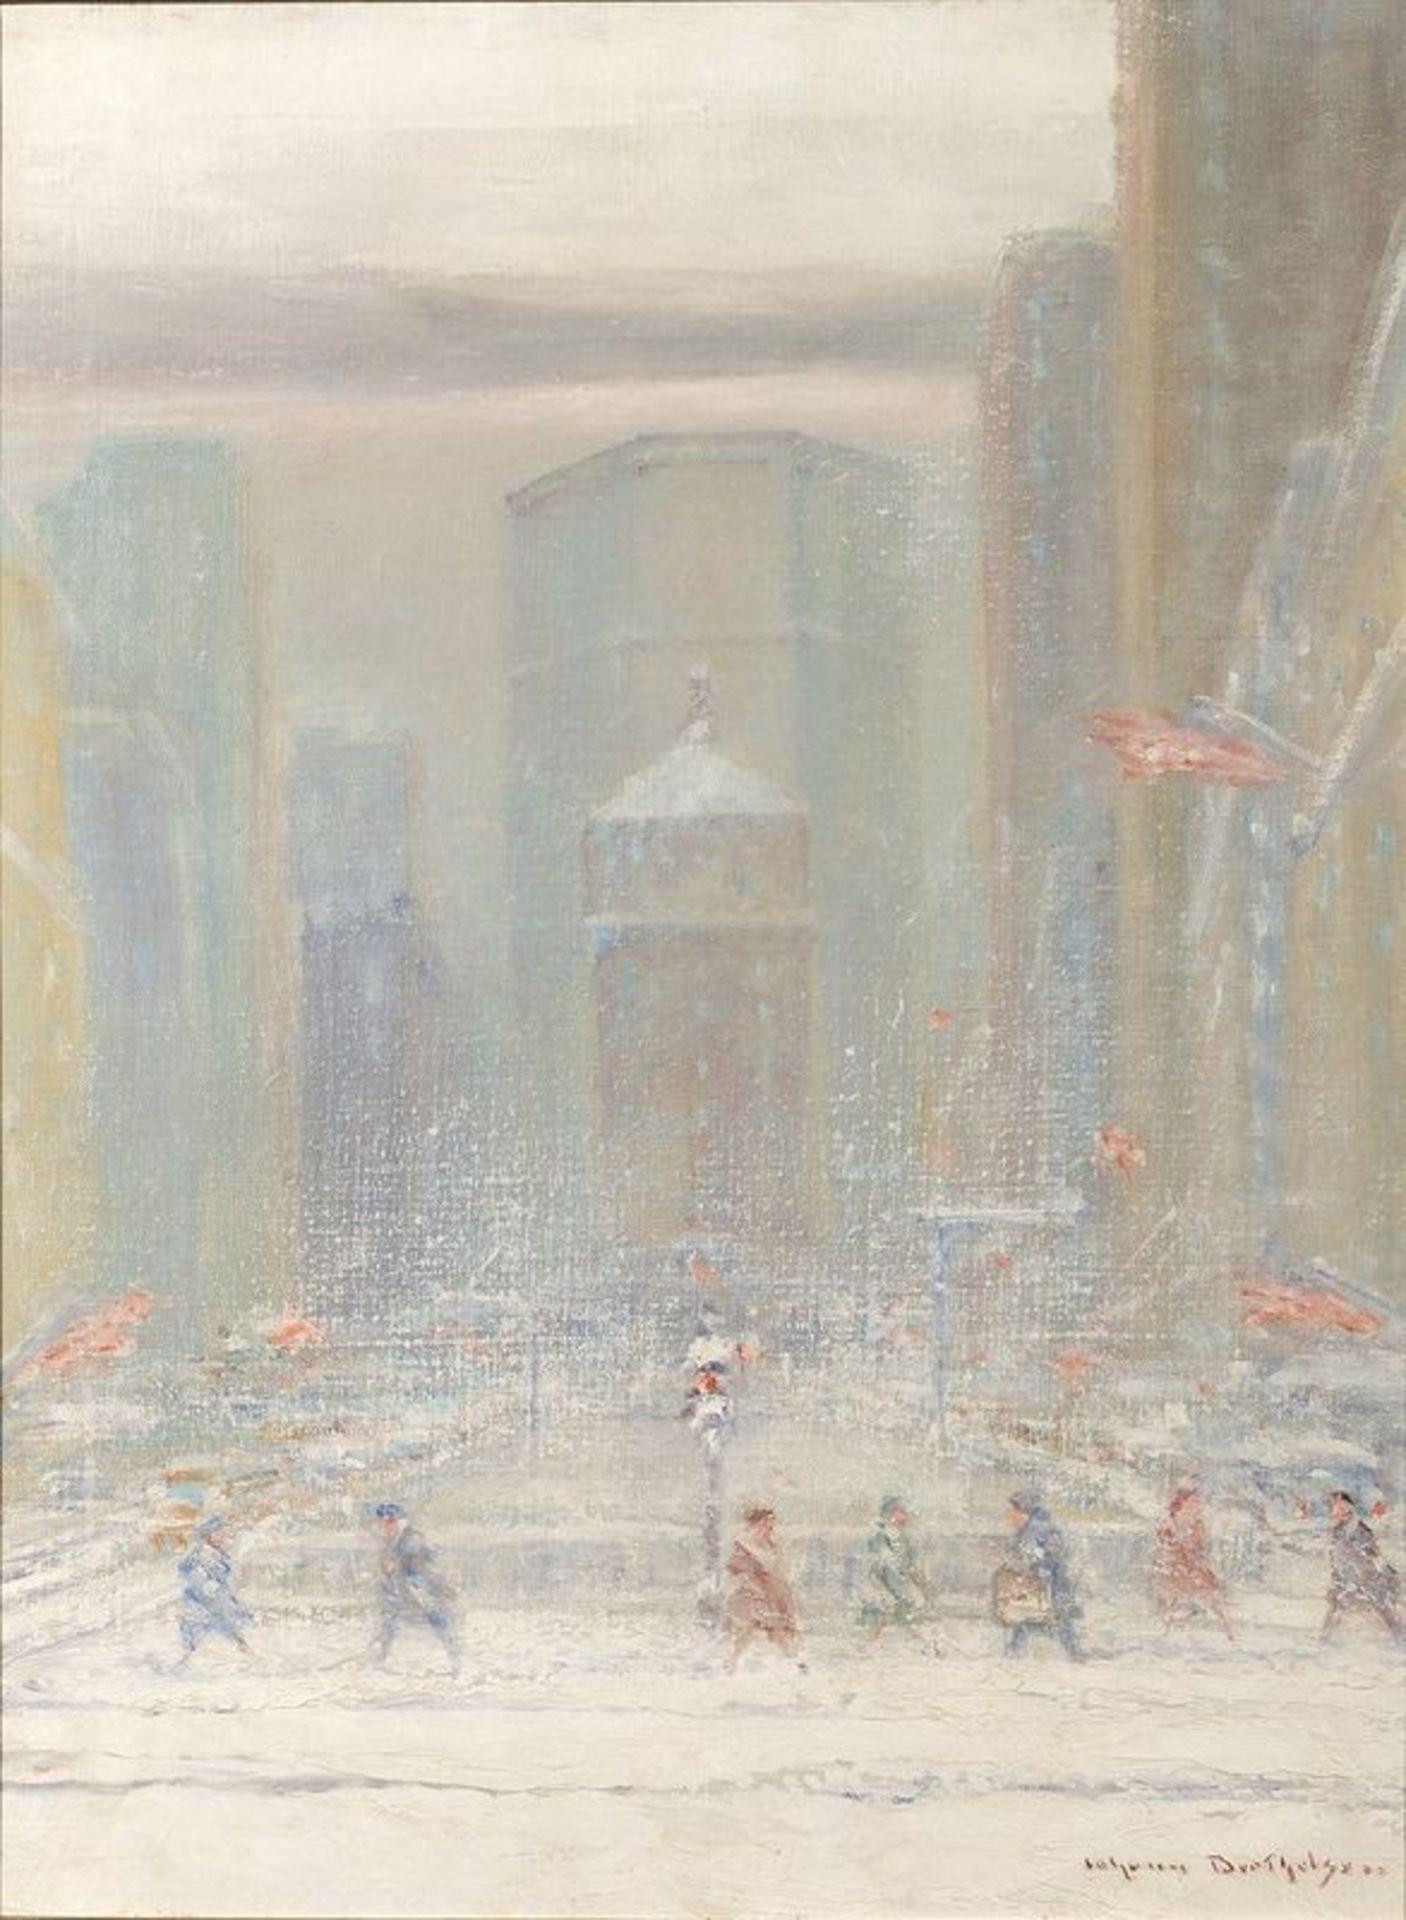 JOHANN HENRIK CARL BERTHELSEN (1883-1972) Park Avenue, New York, 1962 - Signed [...]